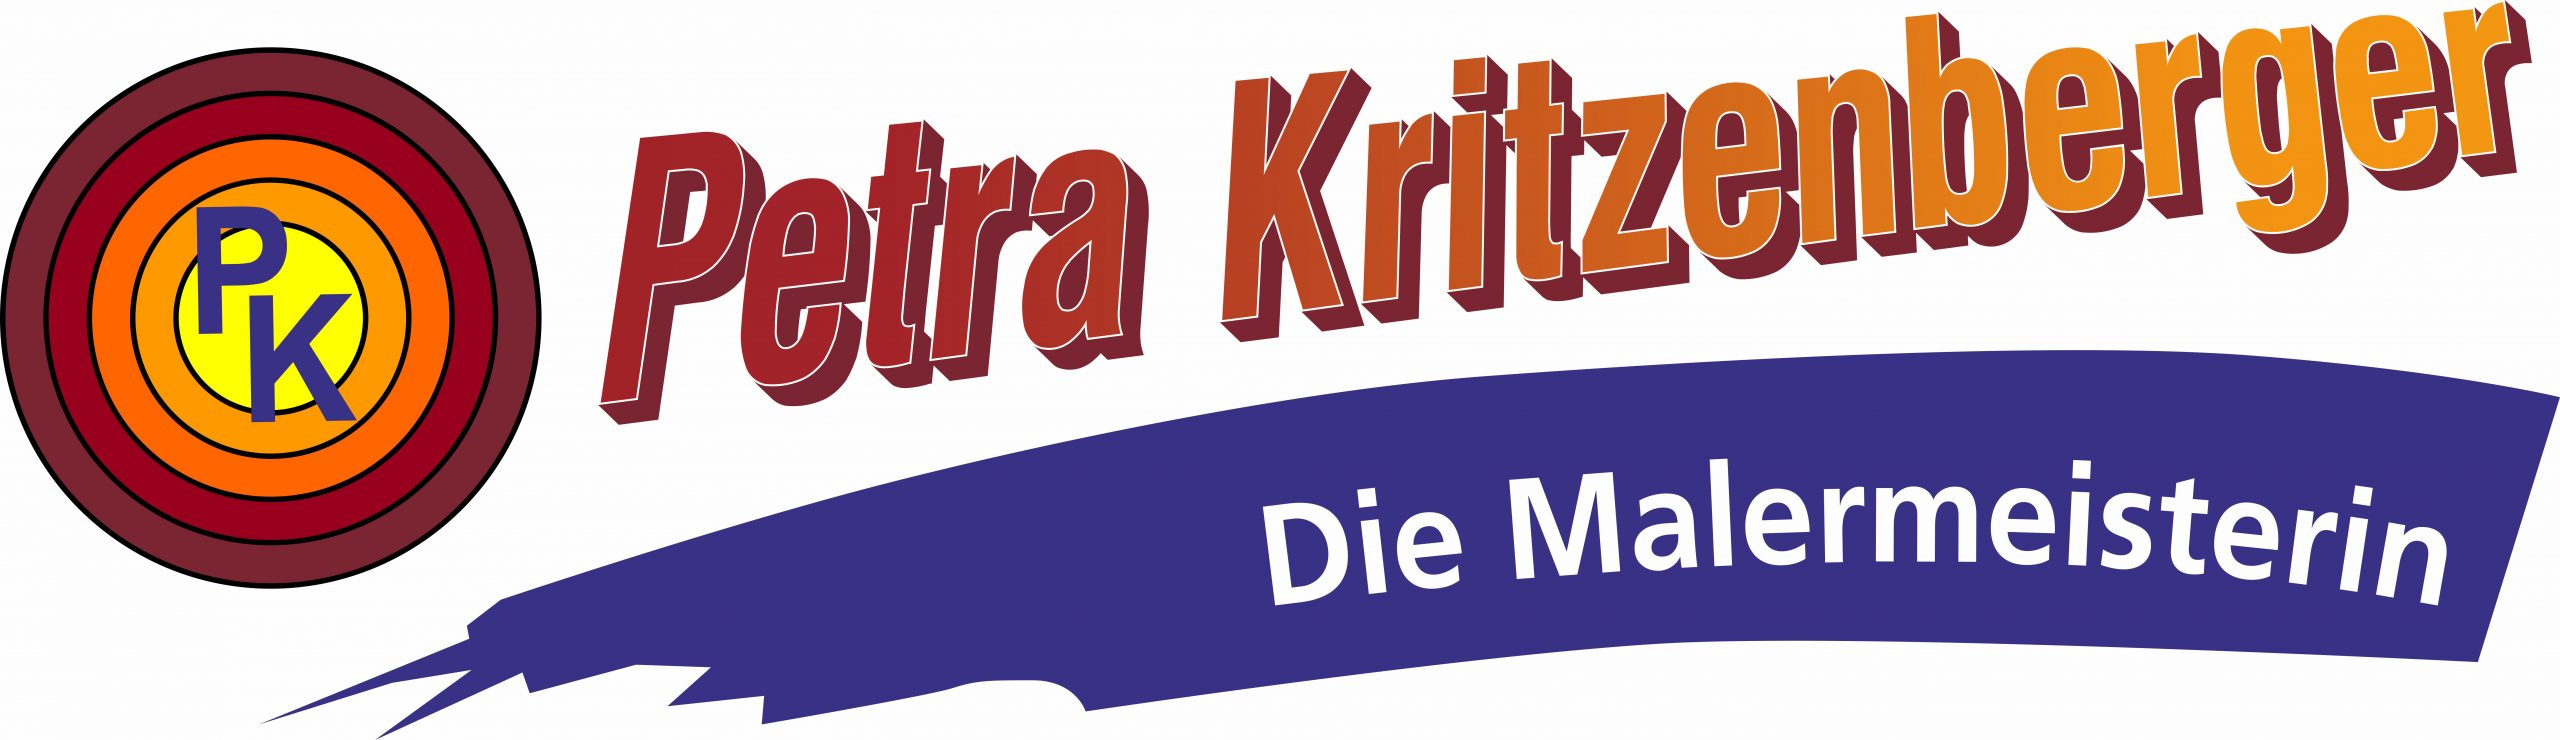 Petra Kritzenberger │ Die Malermeisterin